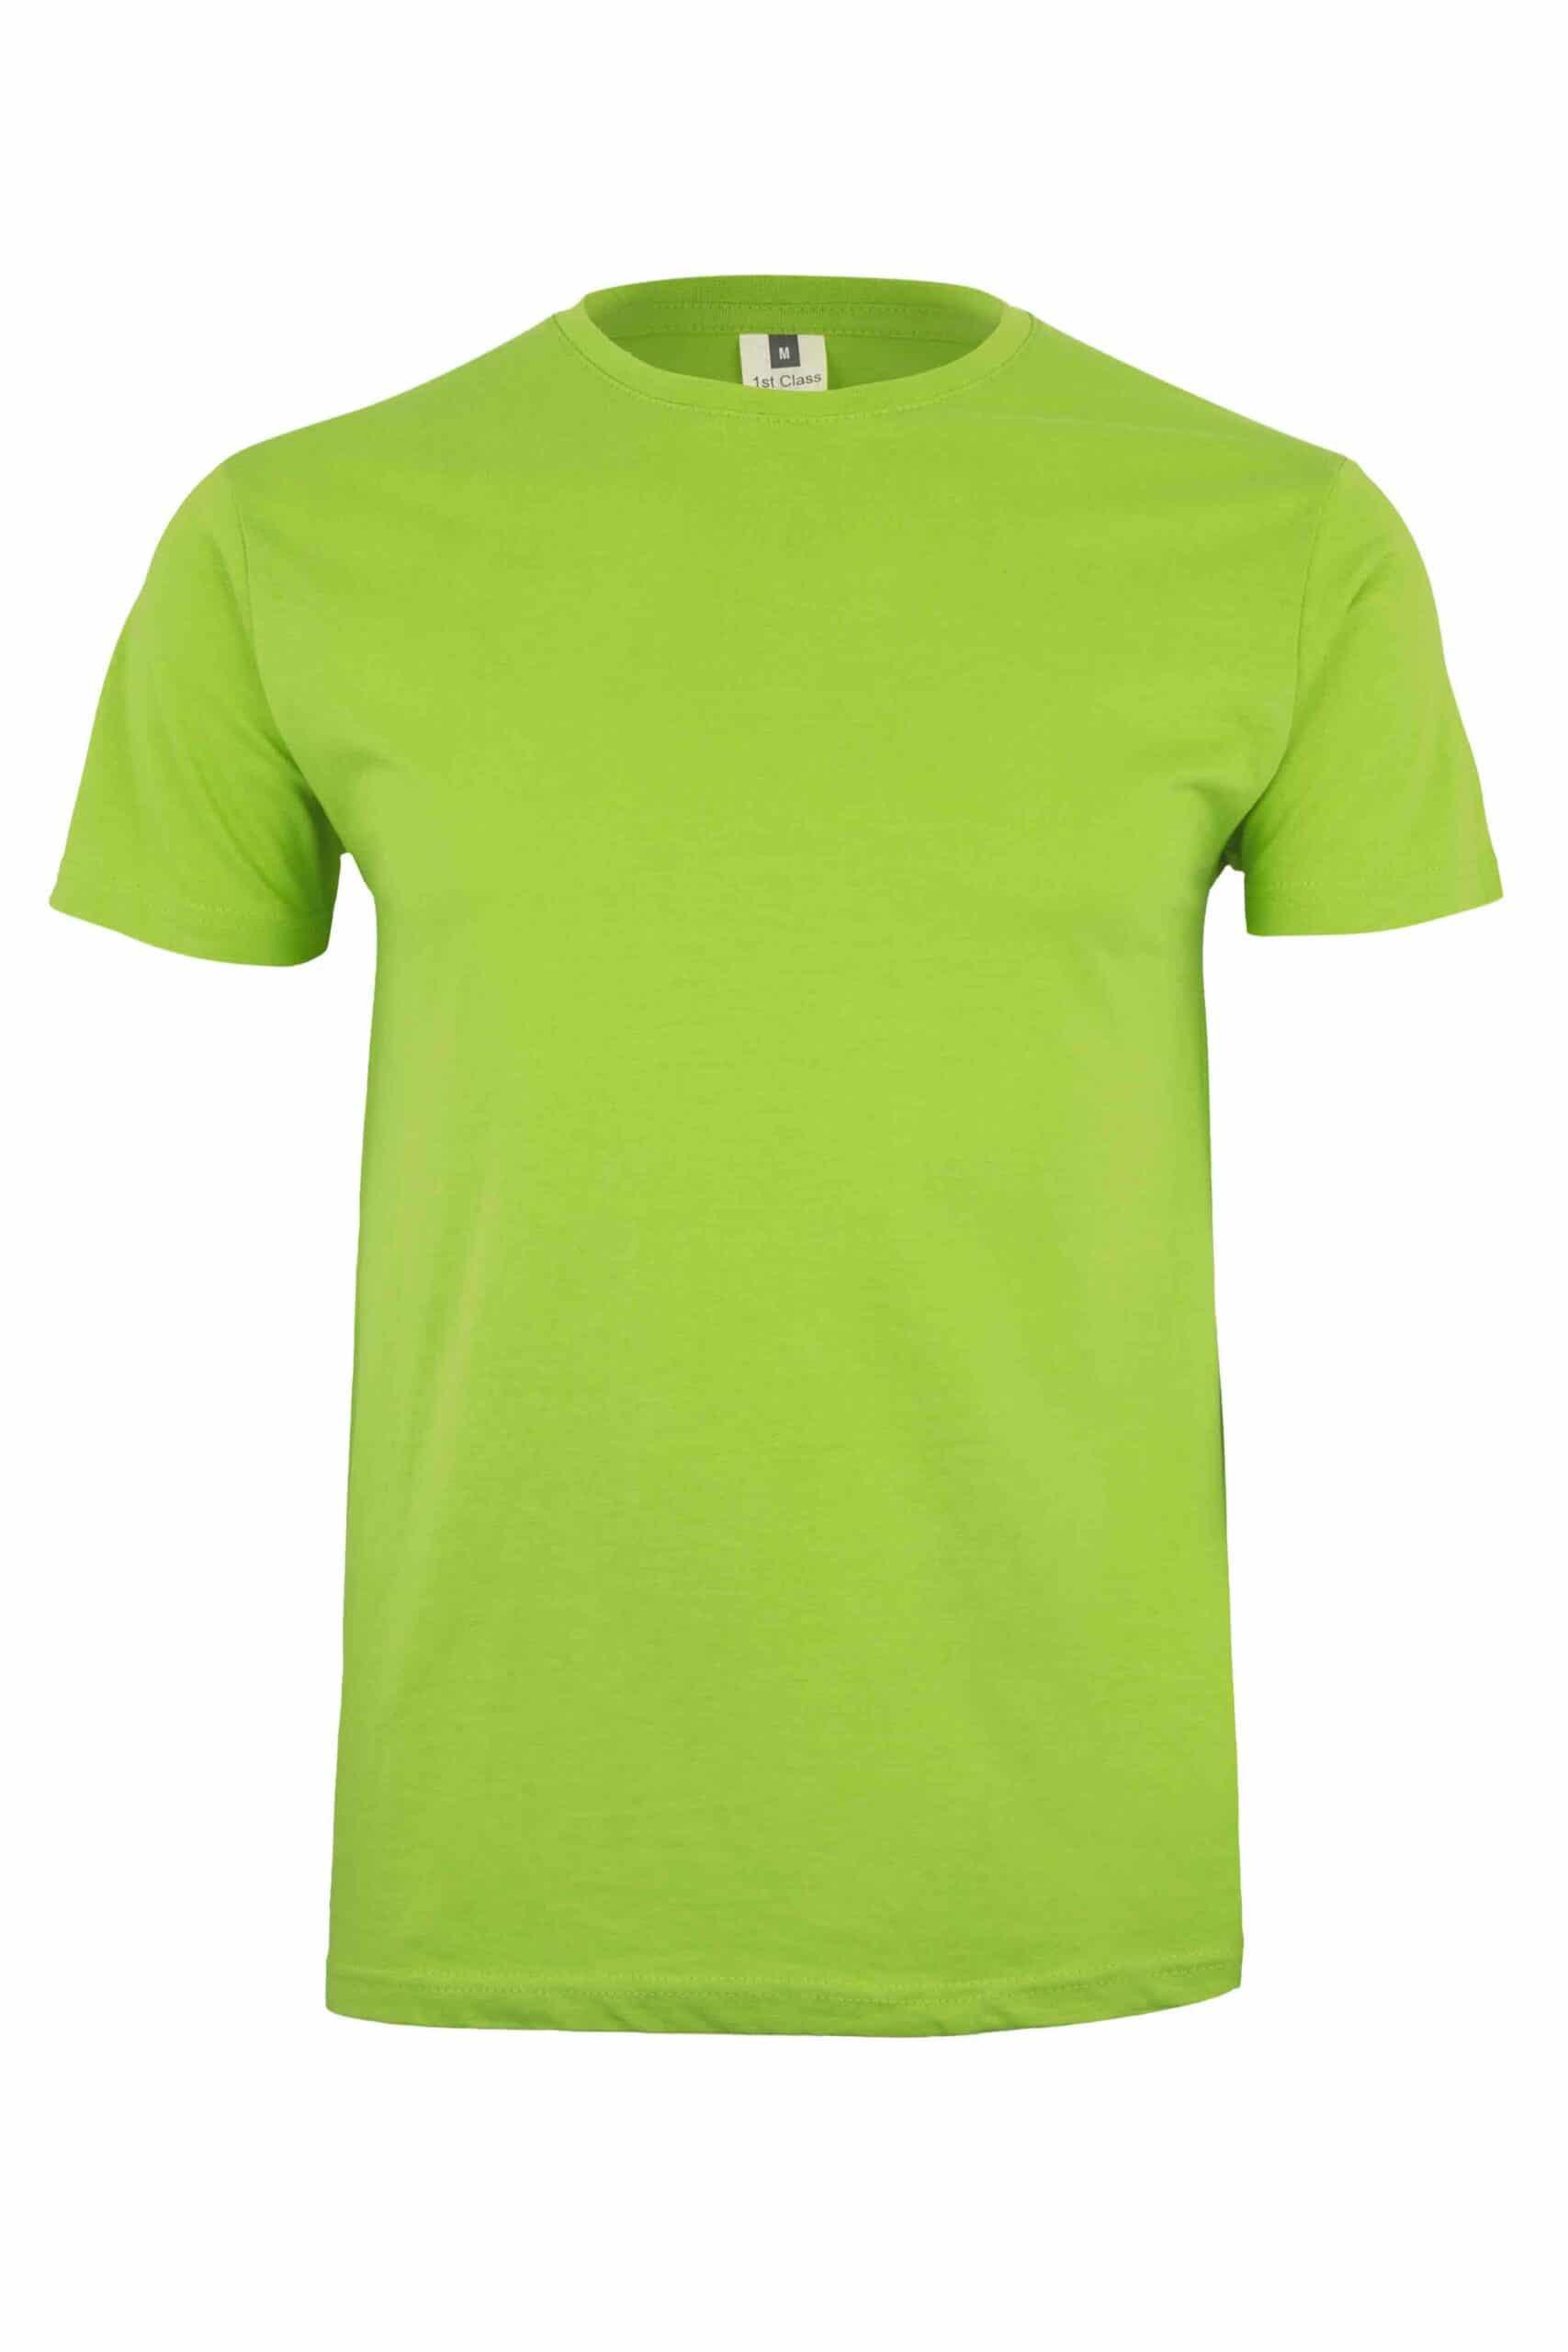 Mukua Mk023cv Camiseta Manga Corta Color 190gr Lime